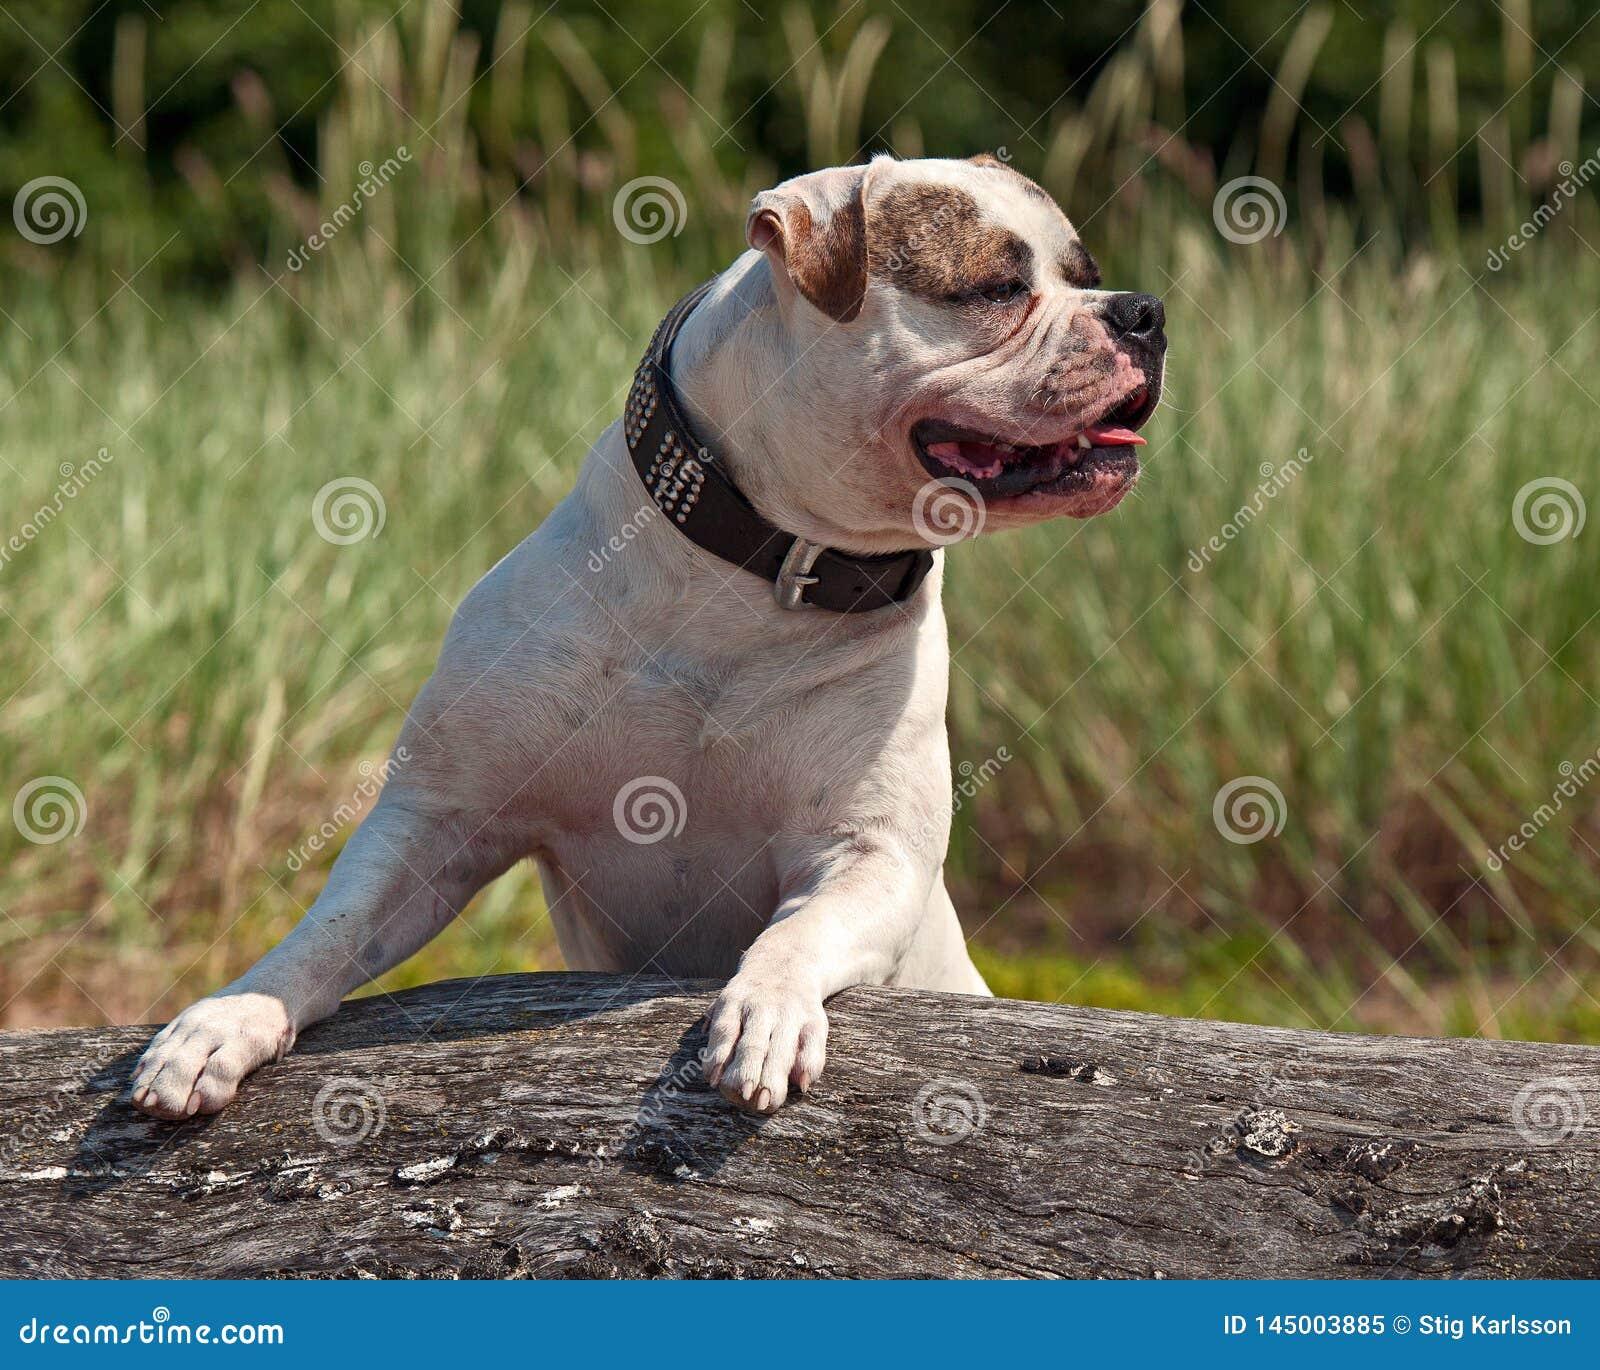 American Bulldog is watching